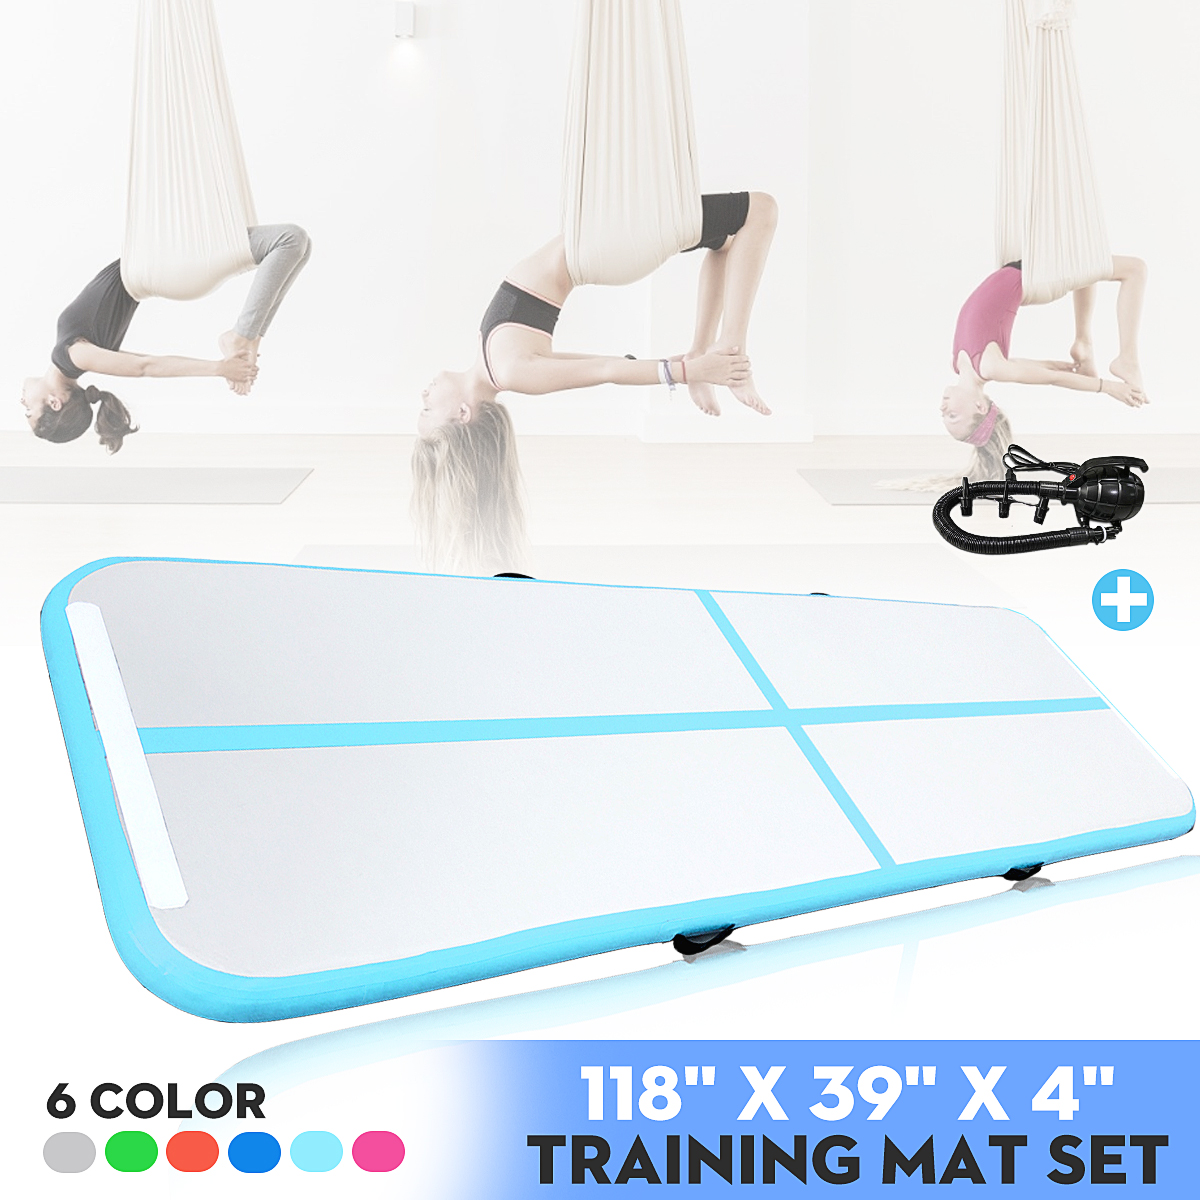 Walmart Gymnastics Mats